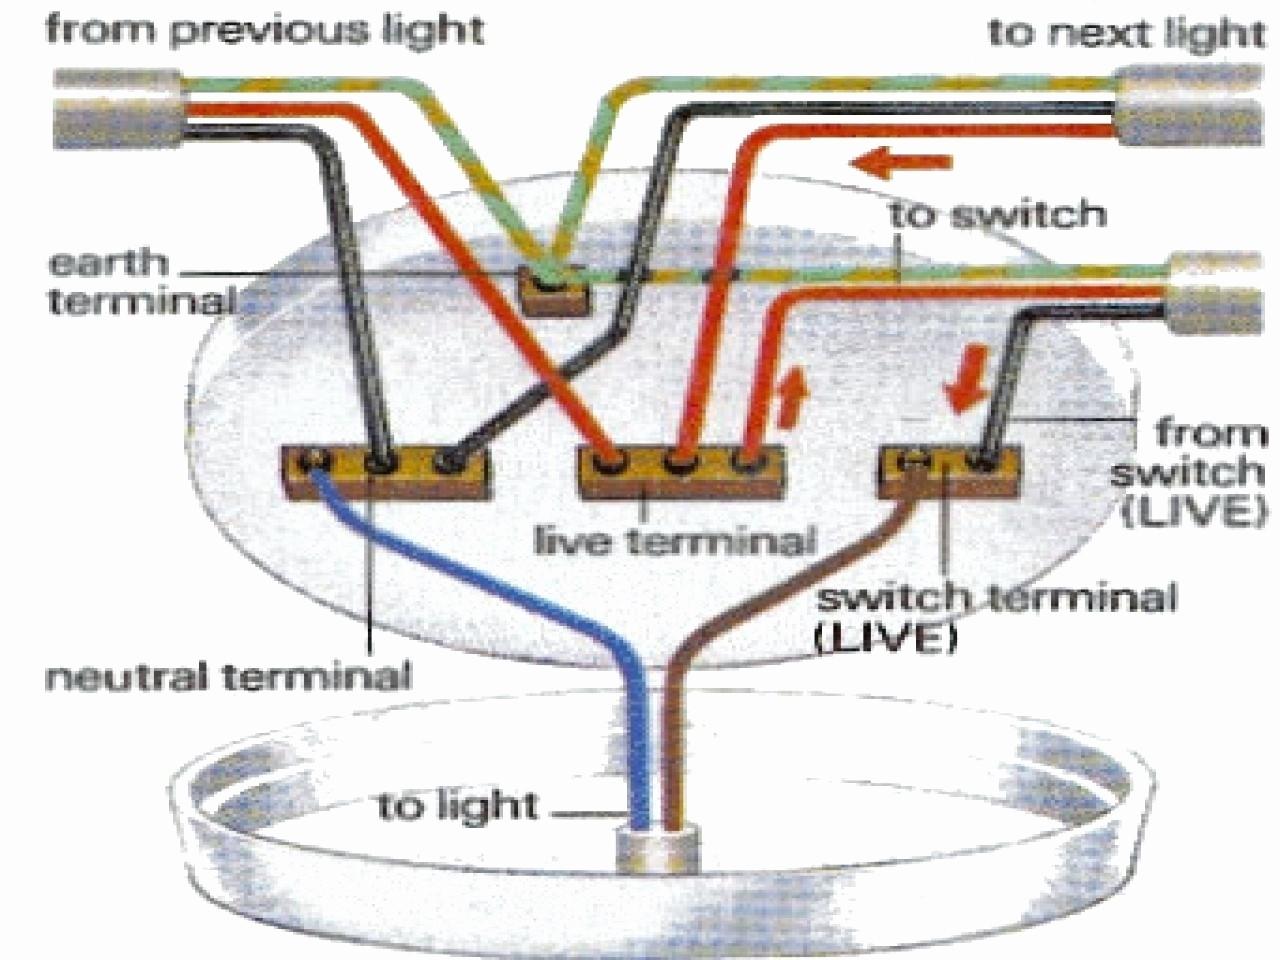 Pleasing Lighthouse Fan Wiring Diagram Standard Electrical Wiring Diagram Wiring Cloud Apomsimijknierdonabenoleattemohammedshrineorg